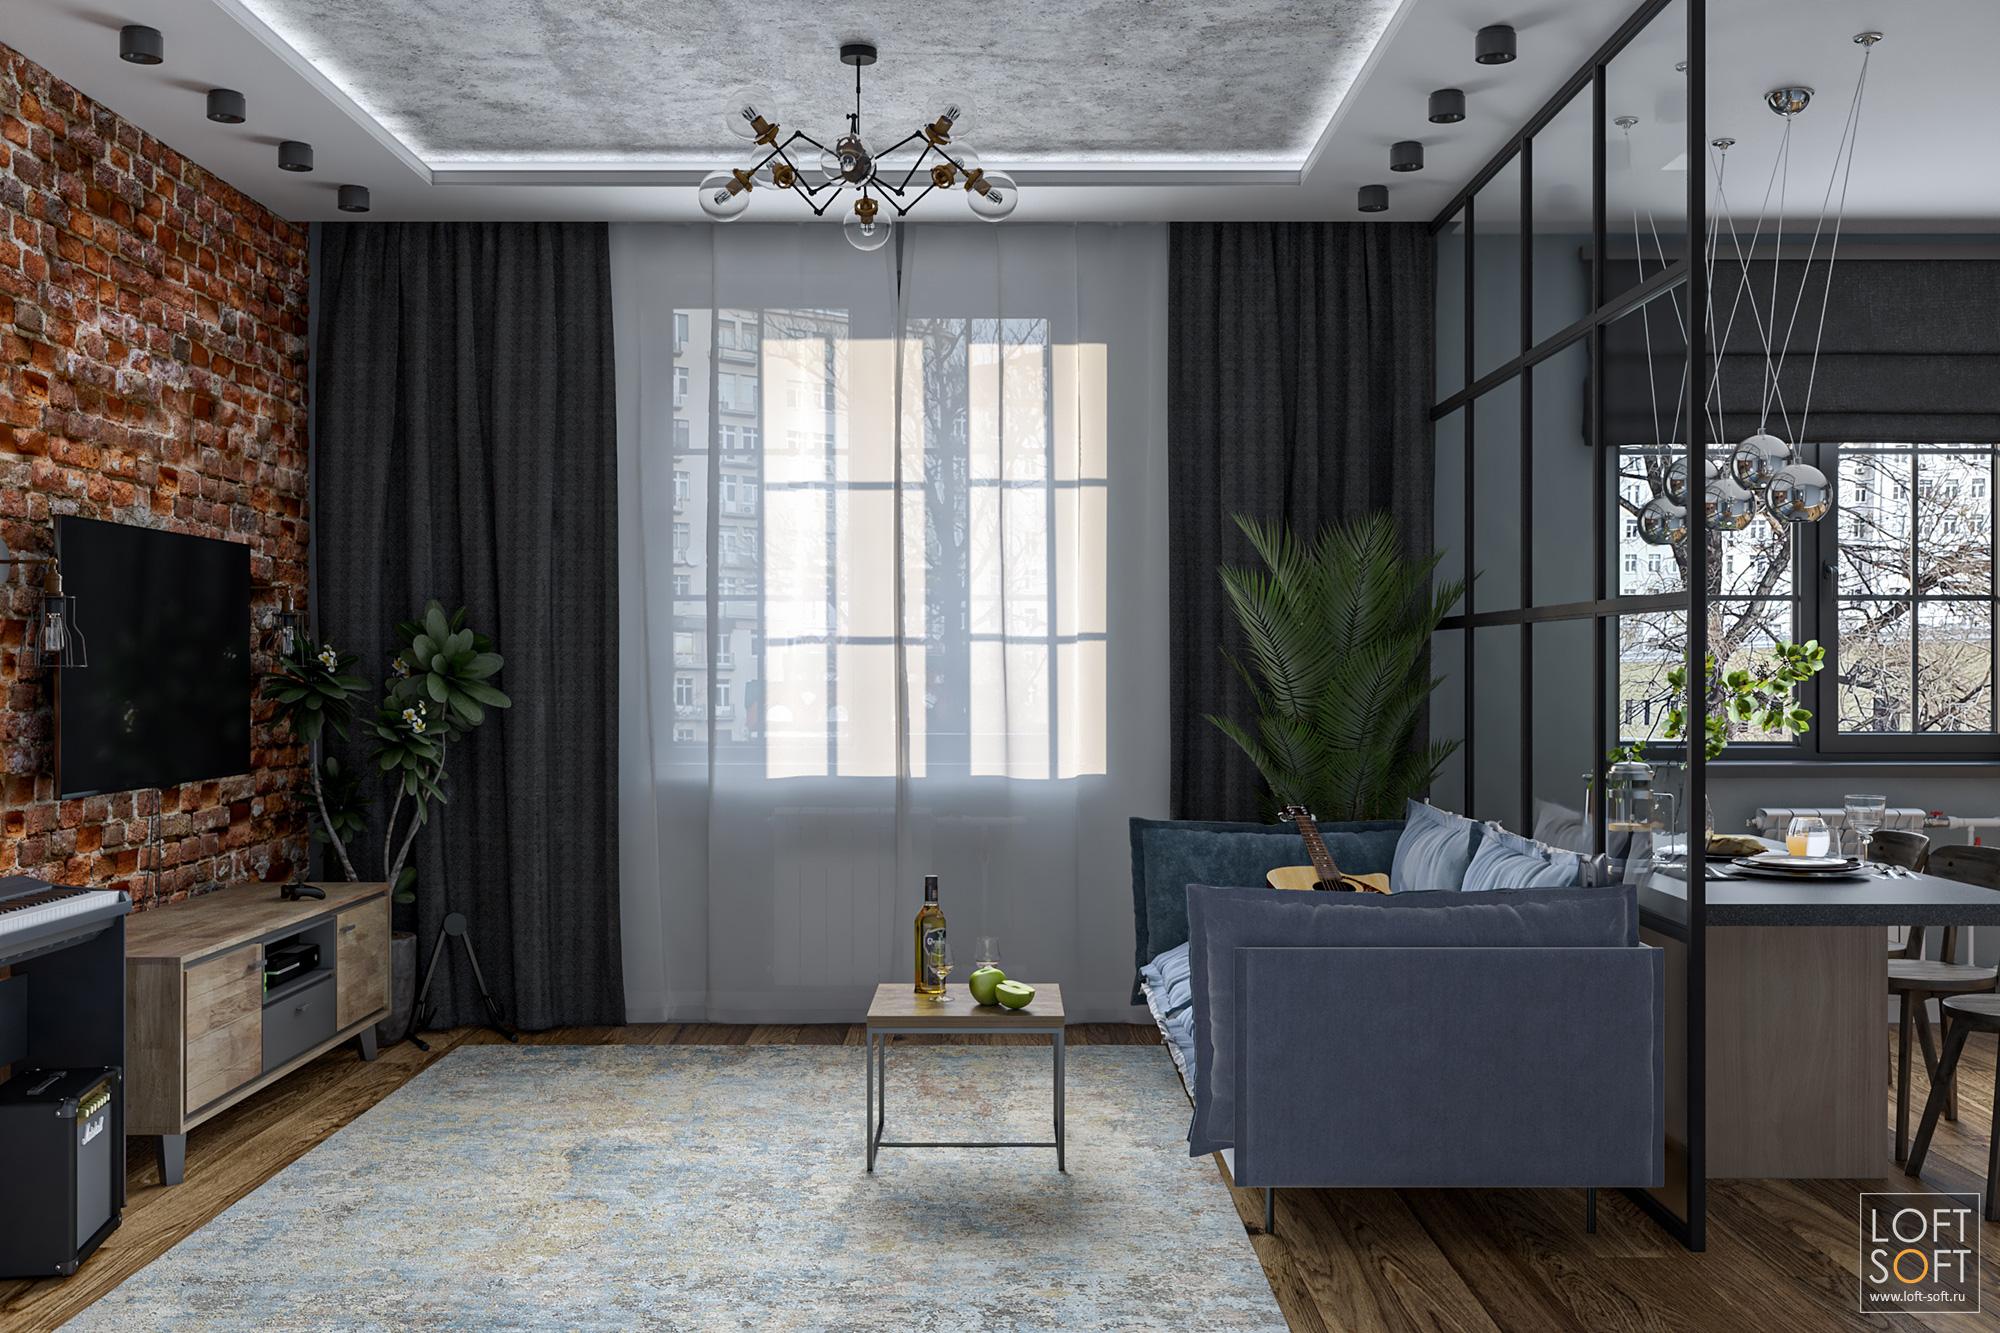 Проект однокомнатной квартиры встиле лофт